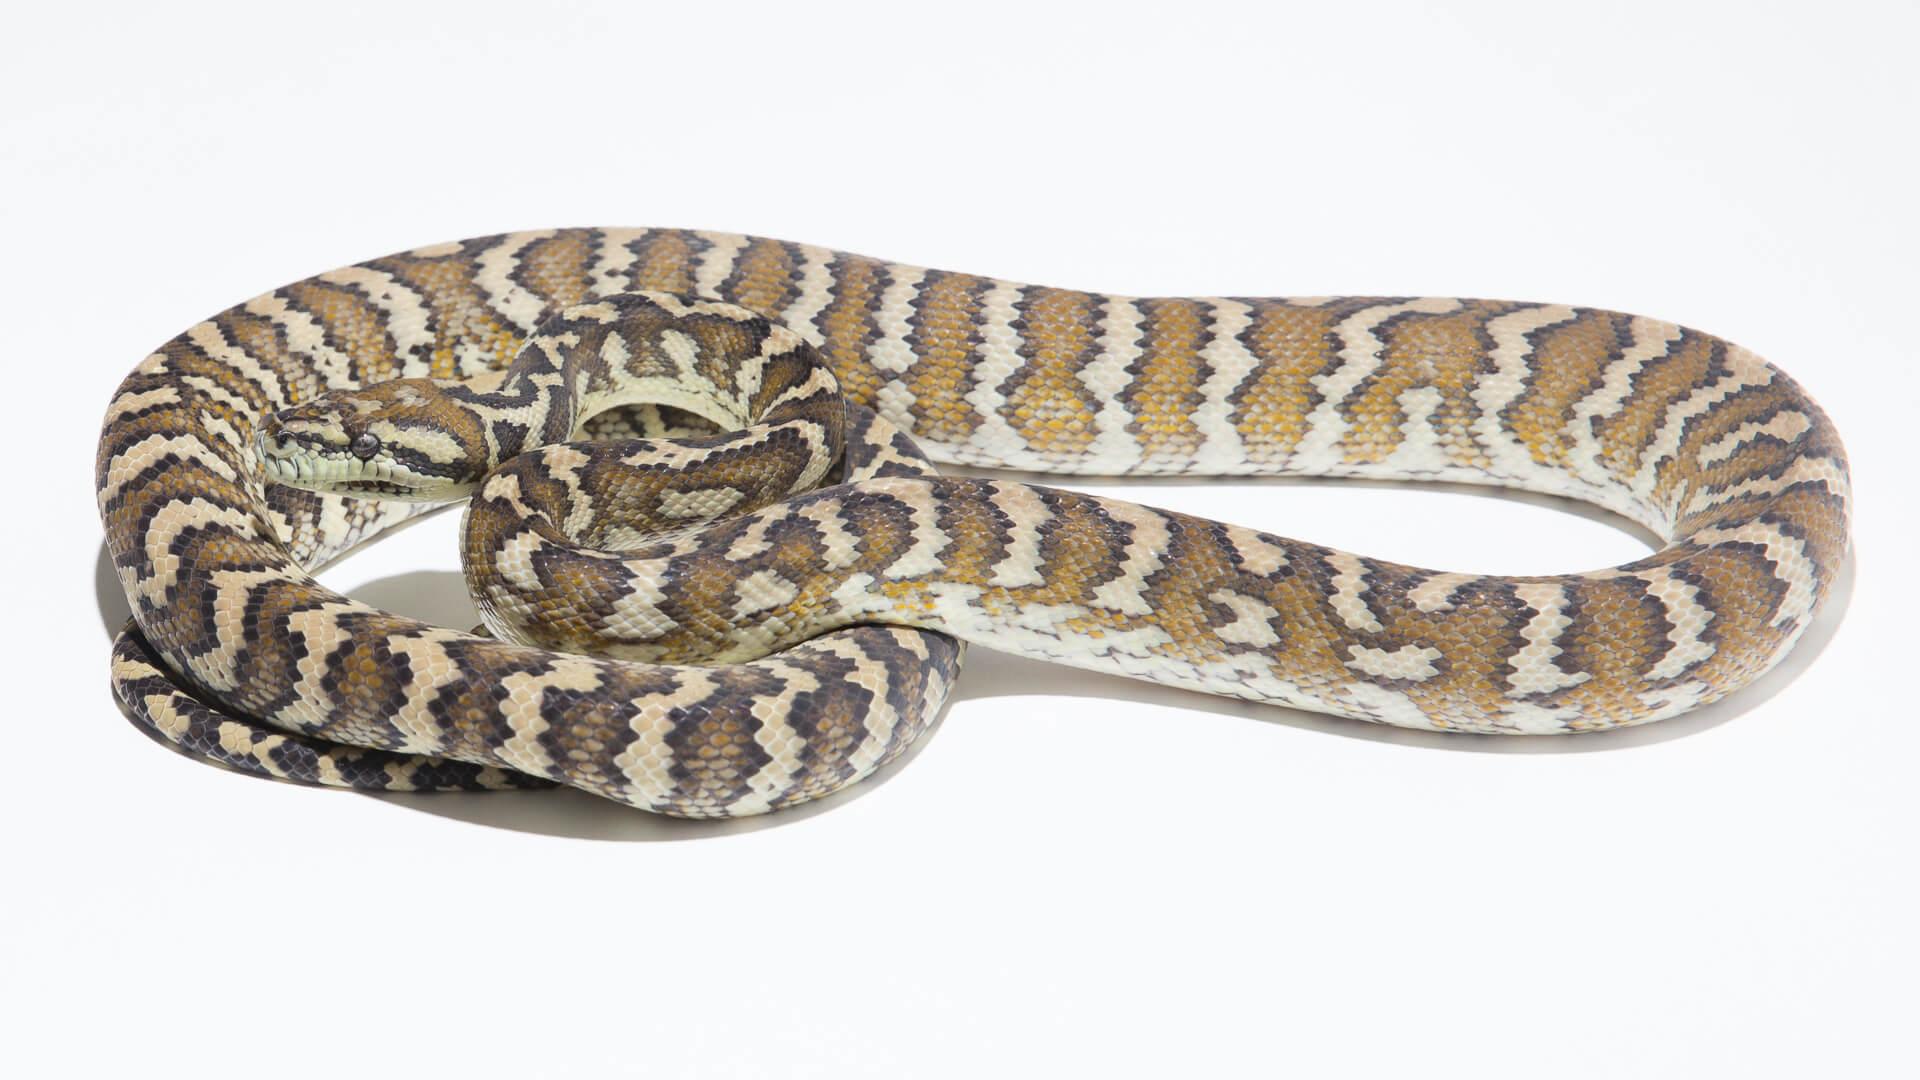 1700d5665f5 Carpet Python Subspecies - The Morelia Spilota Complex